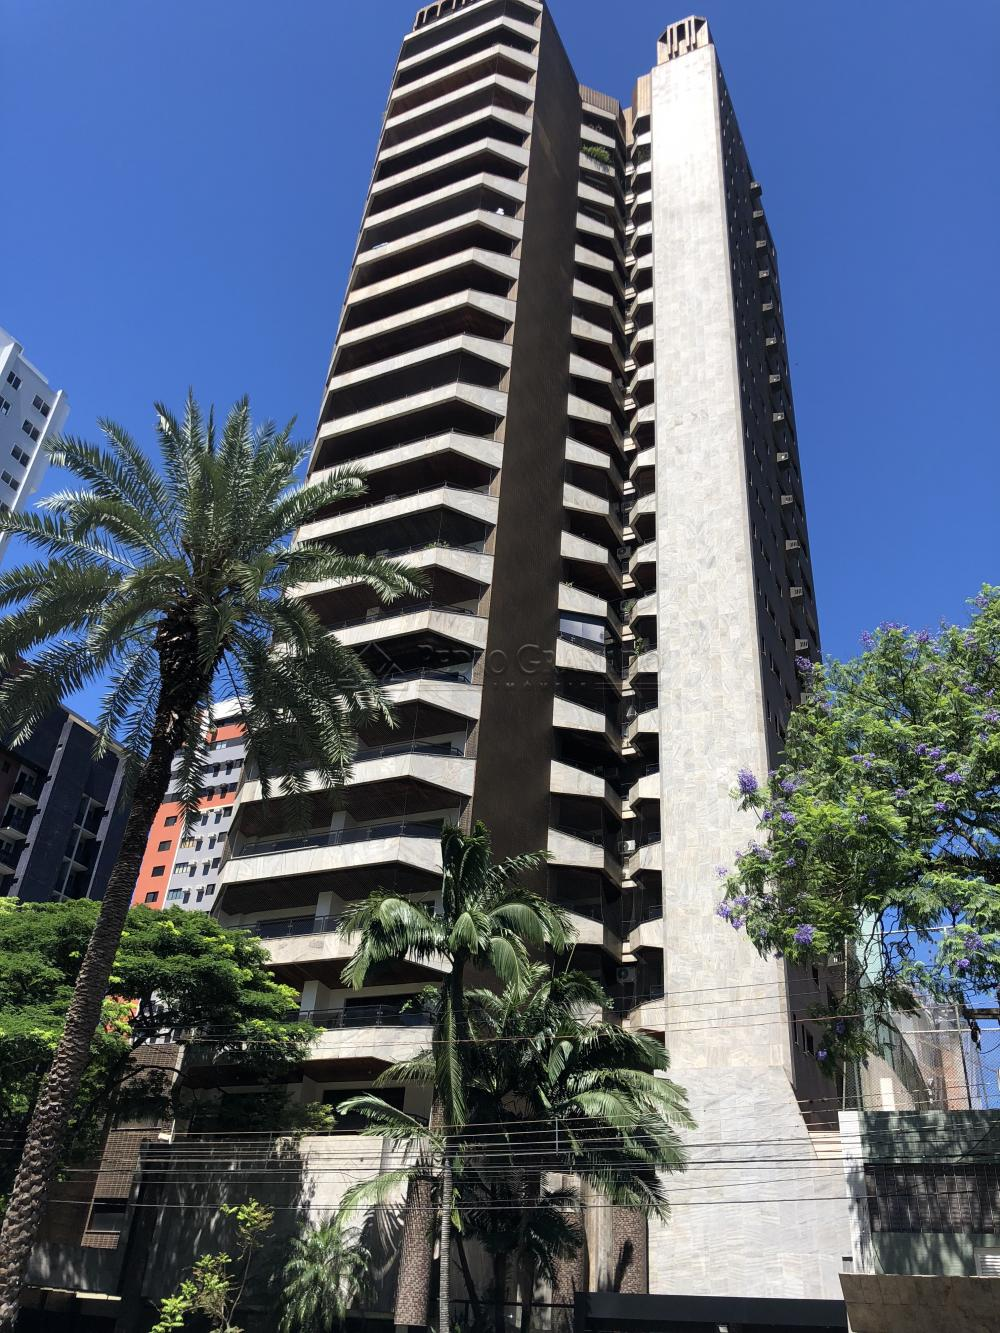 Maringa Apartamento Venda R$2.100.000,00 Condominio R$1.700,00 4 Dormitorios 4 Suites Area construida 365.72m2